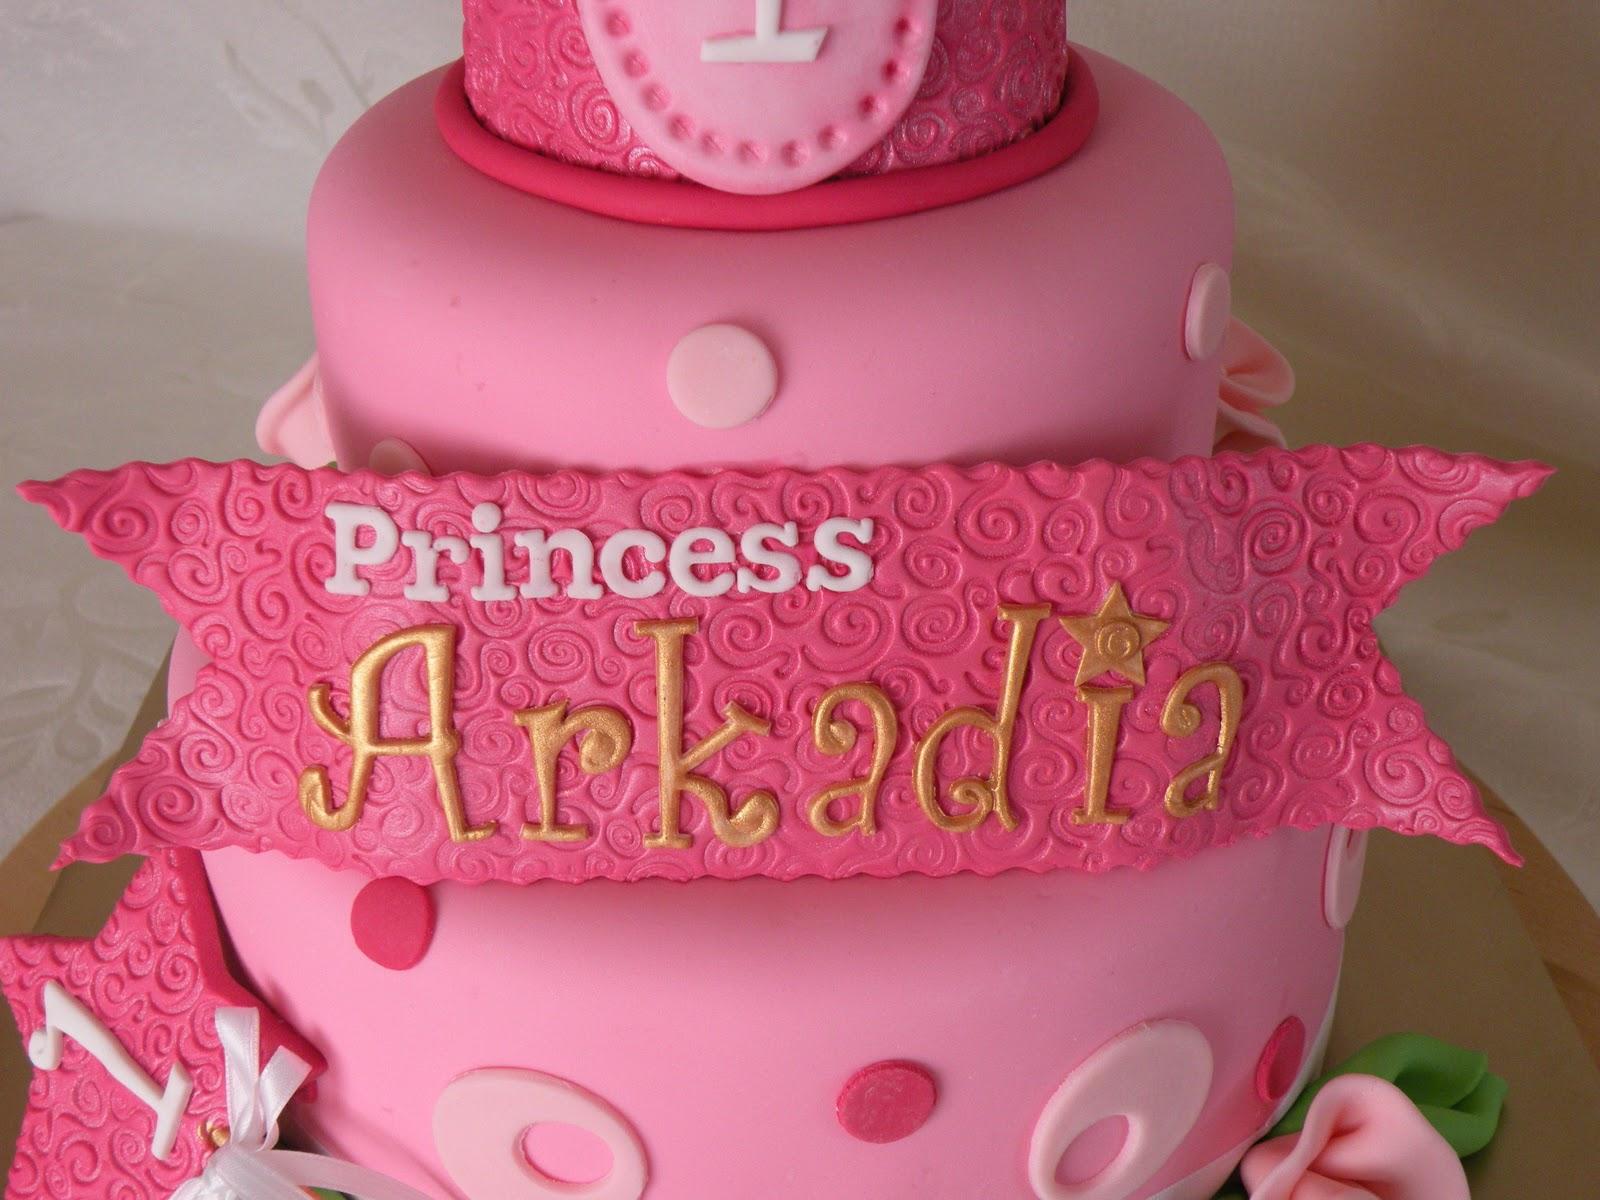 Teresas Tasty Temptations Arkadias 1st Birthday Princess Cake